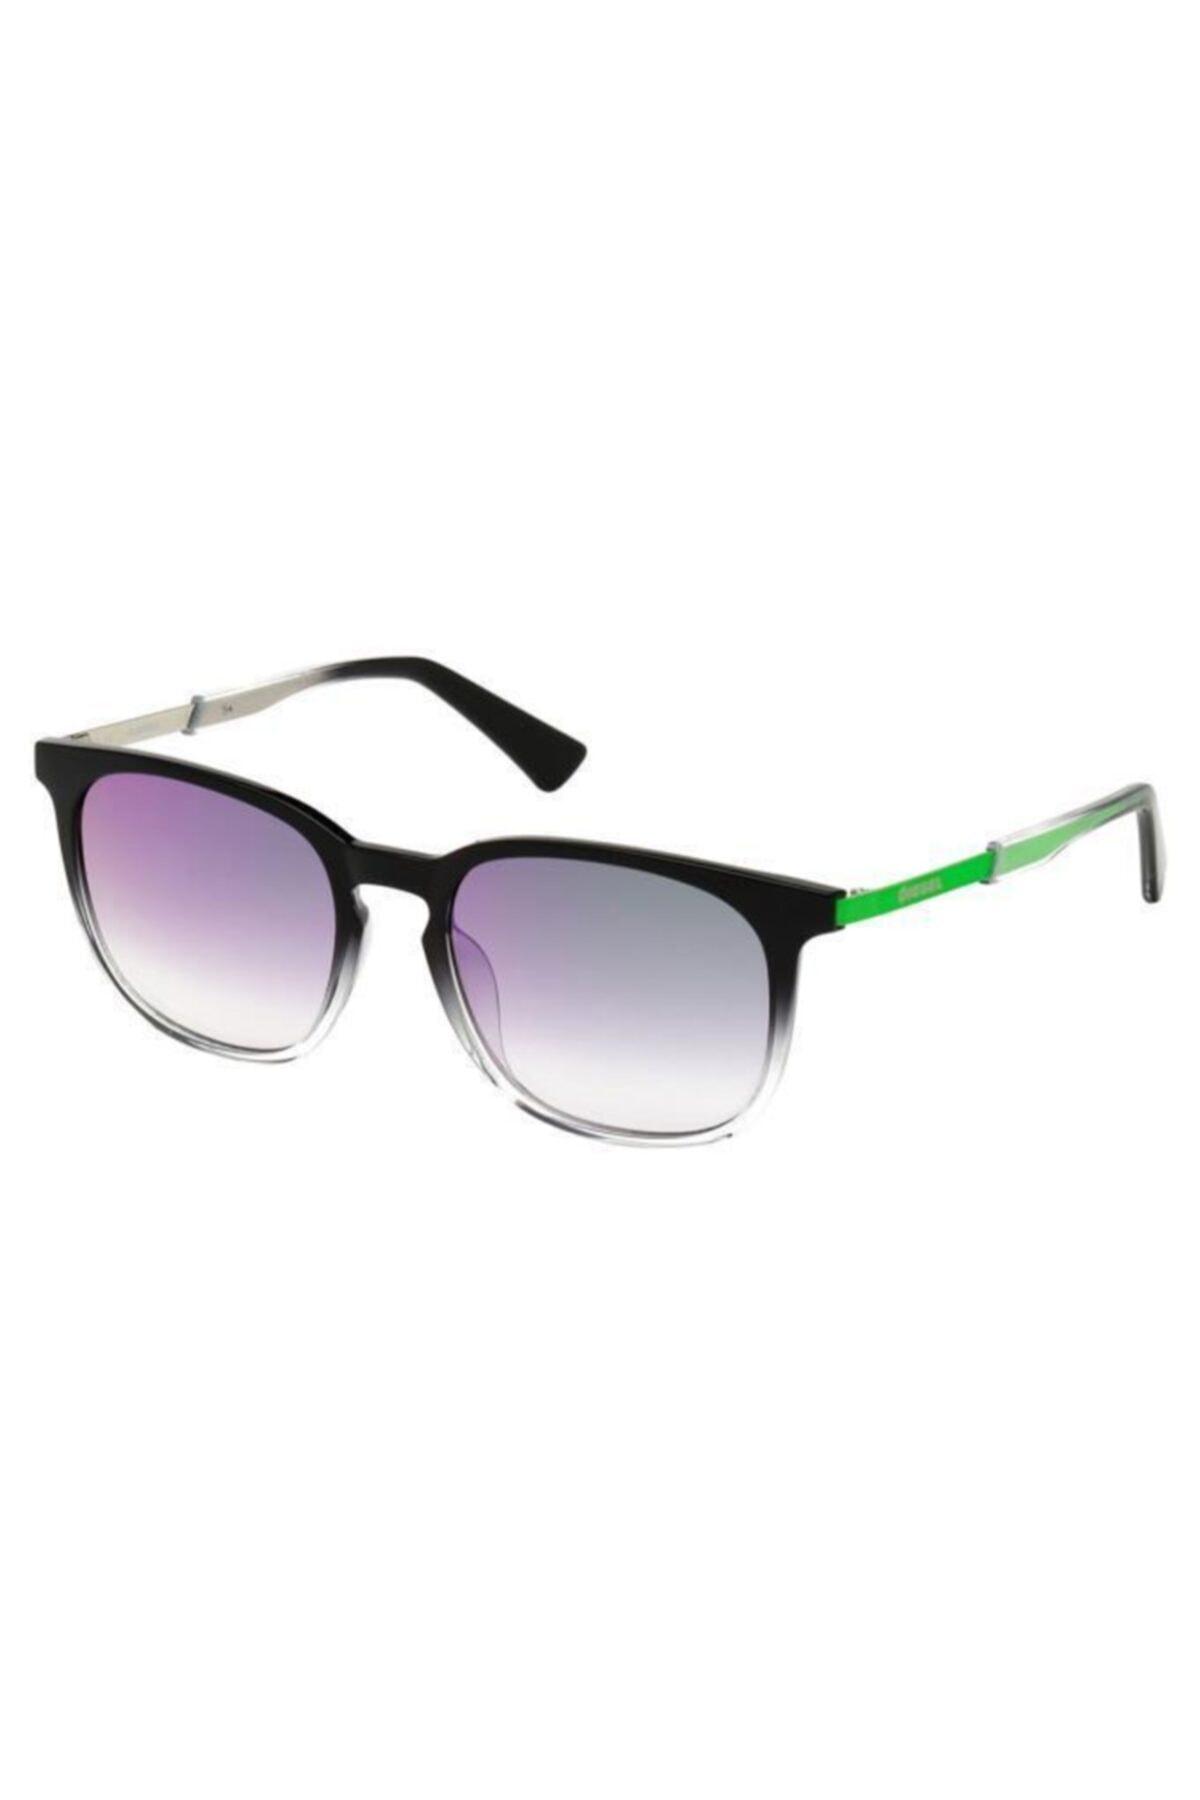 فروش پستی عینک آفتابی اسپرت برند دیزل رنگ مشکی کد ty87651276